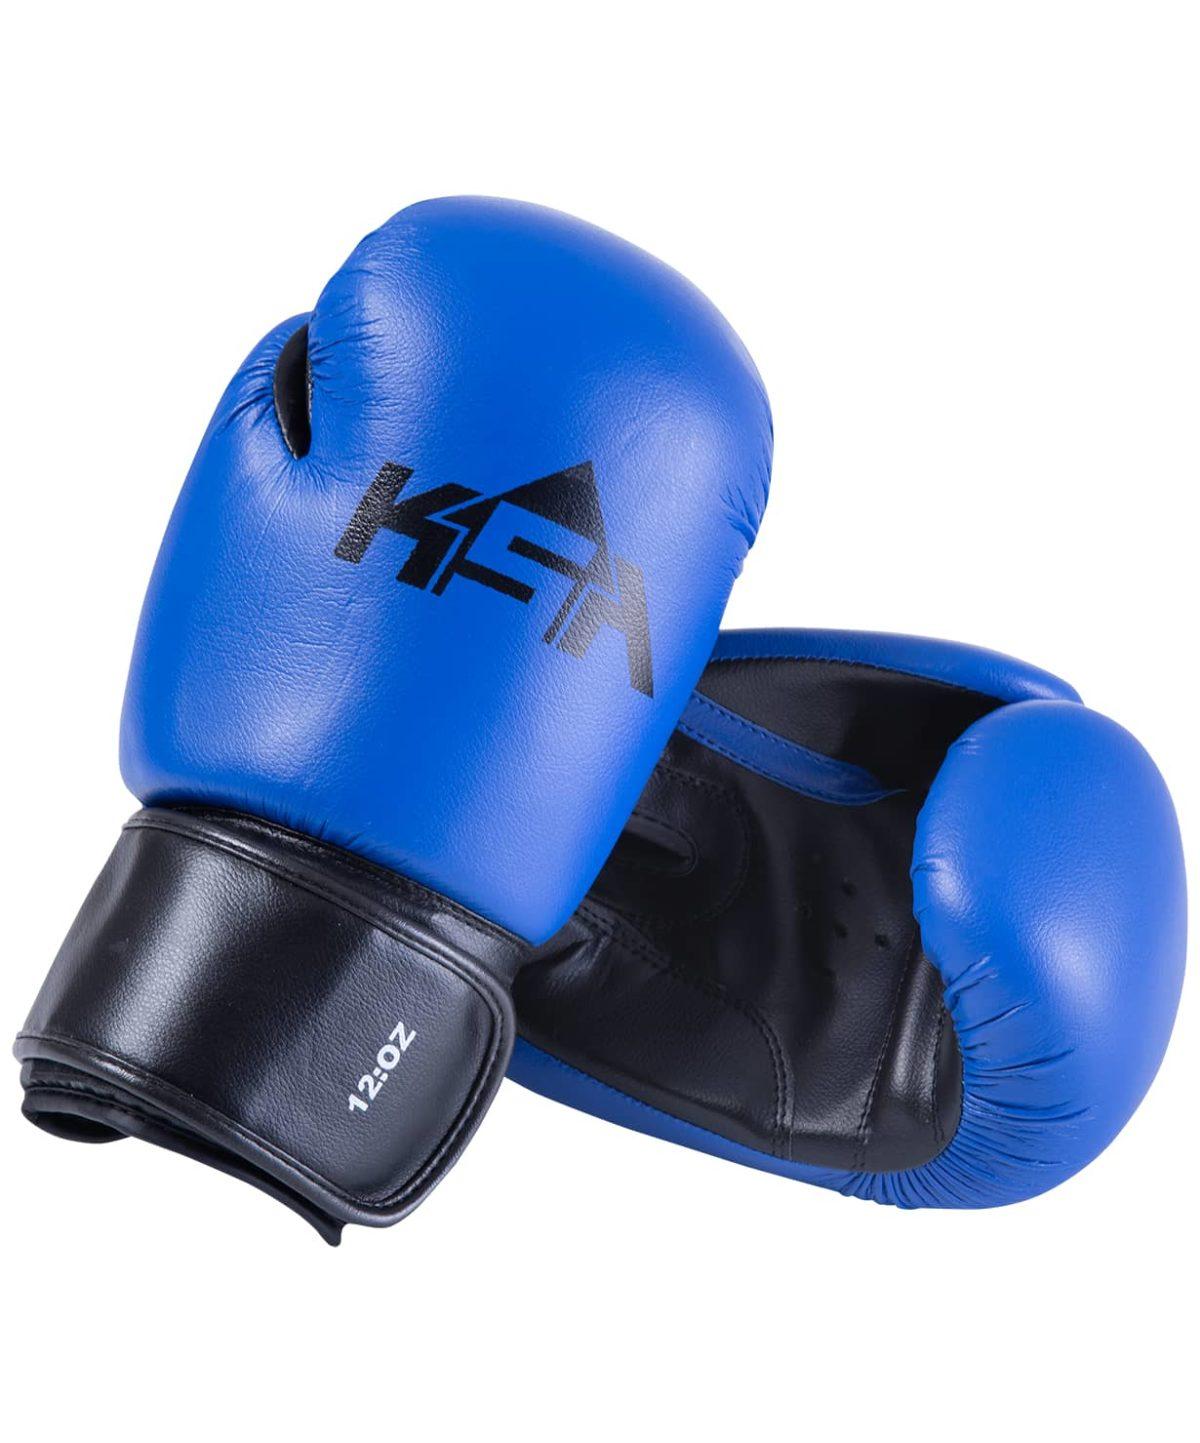 KSA Spider Blue Перчатки боксерские, 6 oz, к/з   17804 - 1